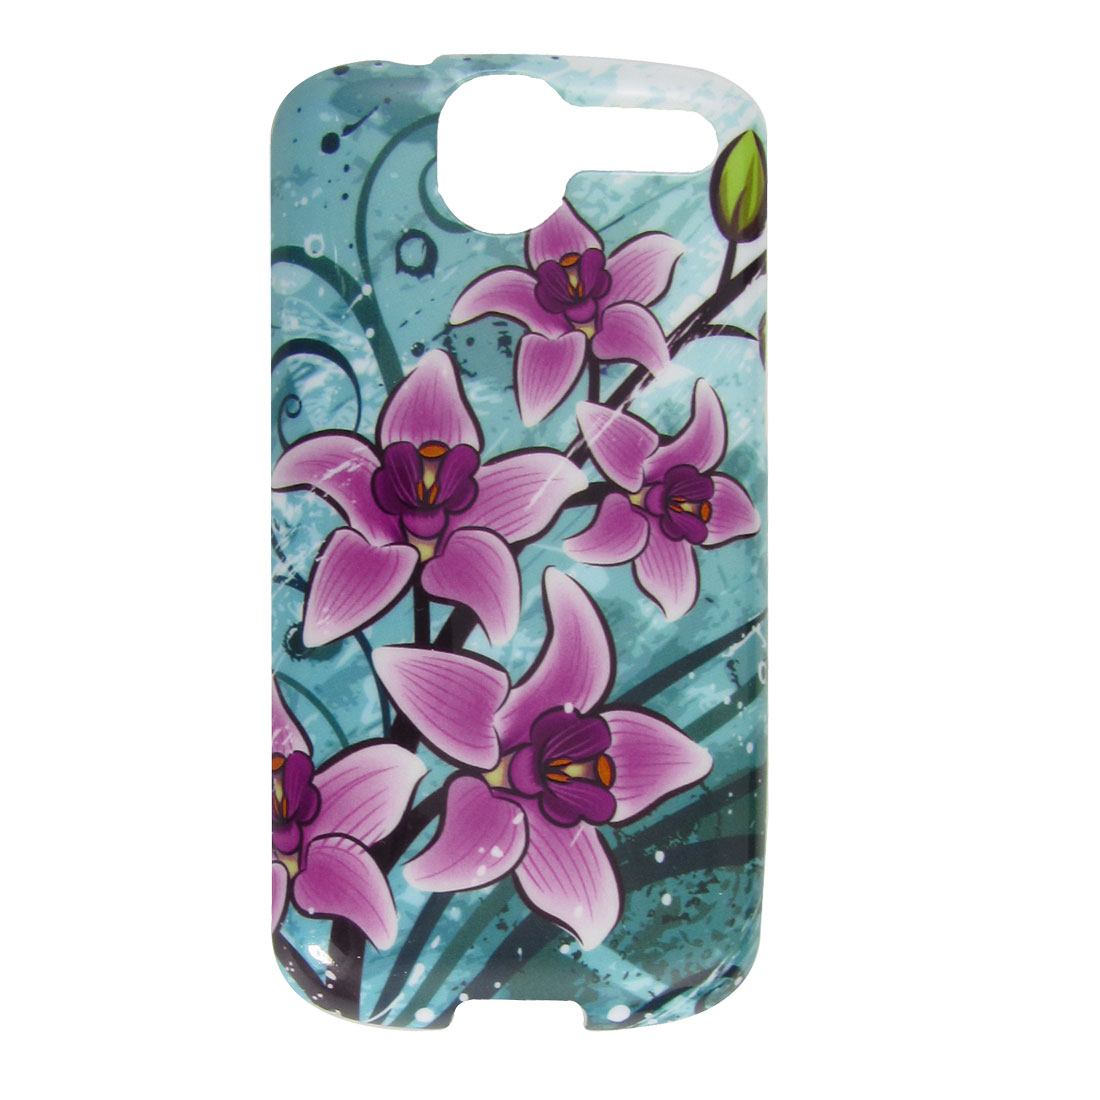 Purple Flower Print Cyan Hard Plastic IMD Back Case for HTC G7